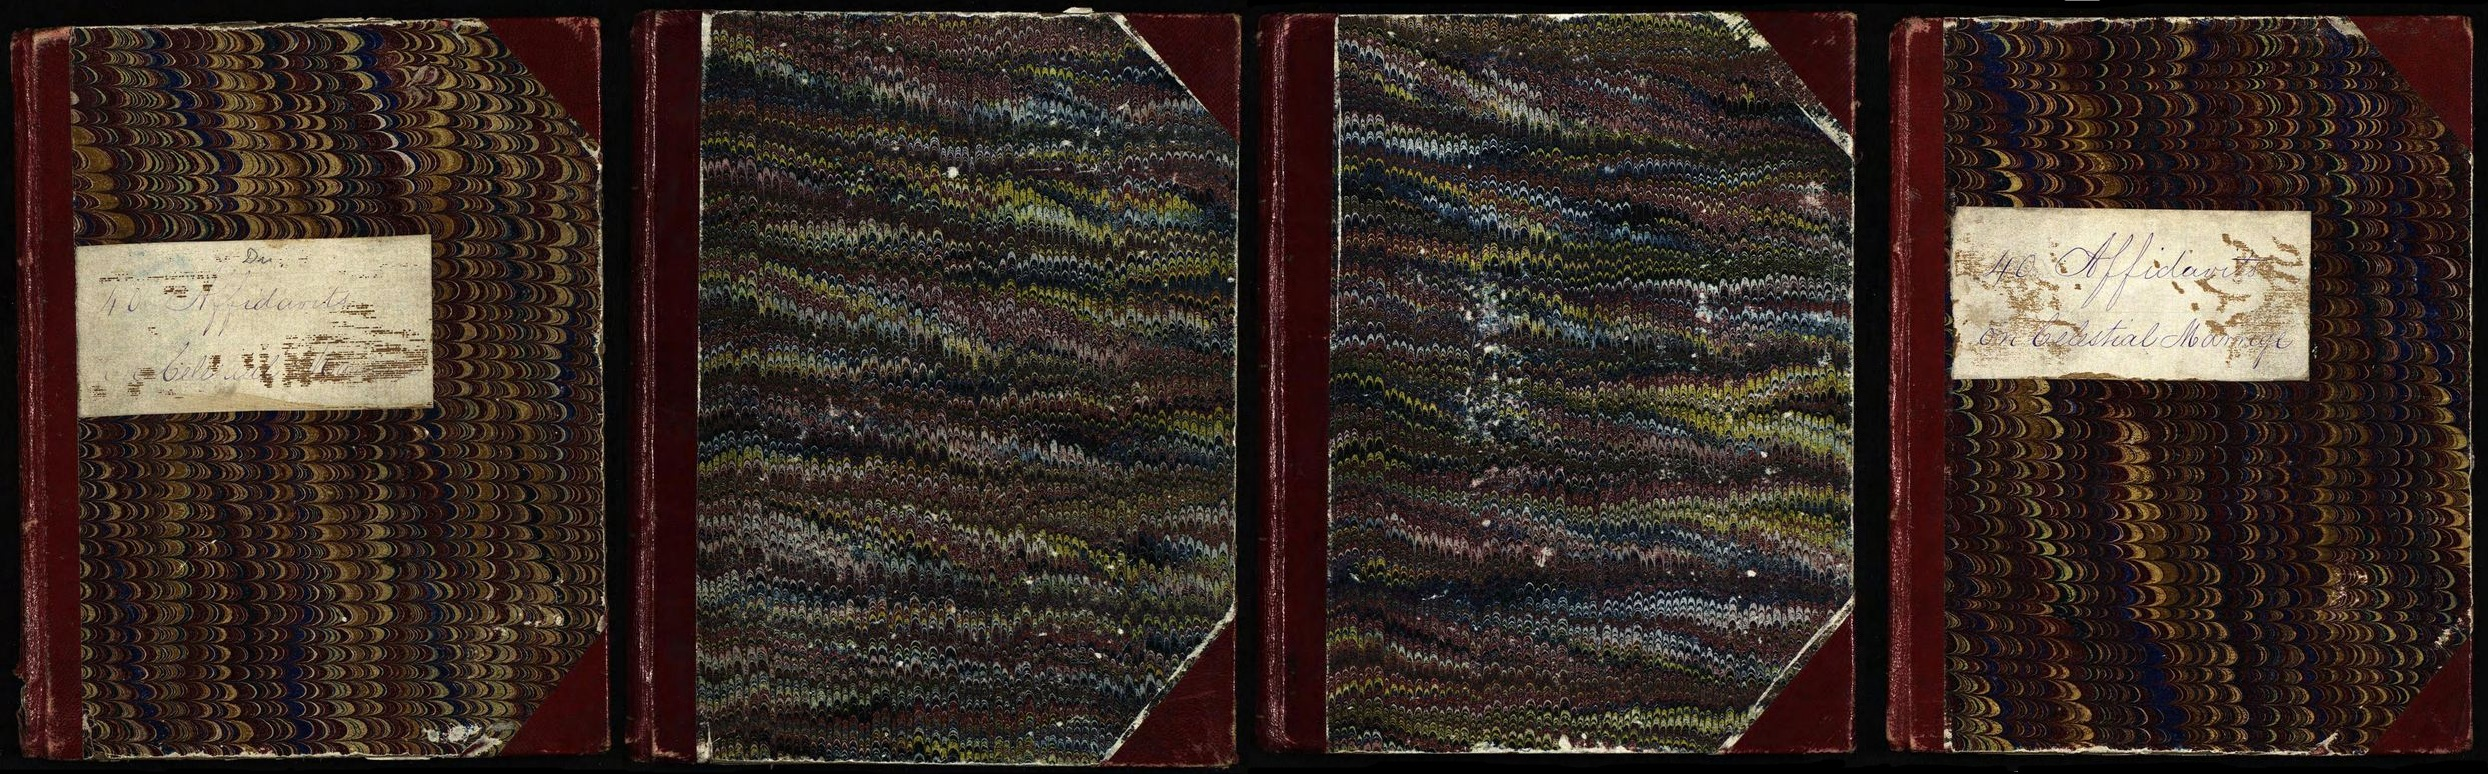 Brian Hales Polygamy Sylvia Lyon & The 1869 Utah Affidavits